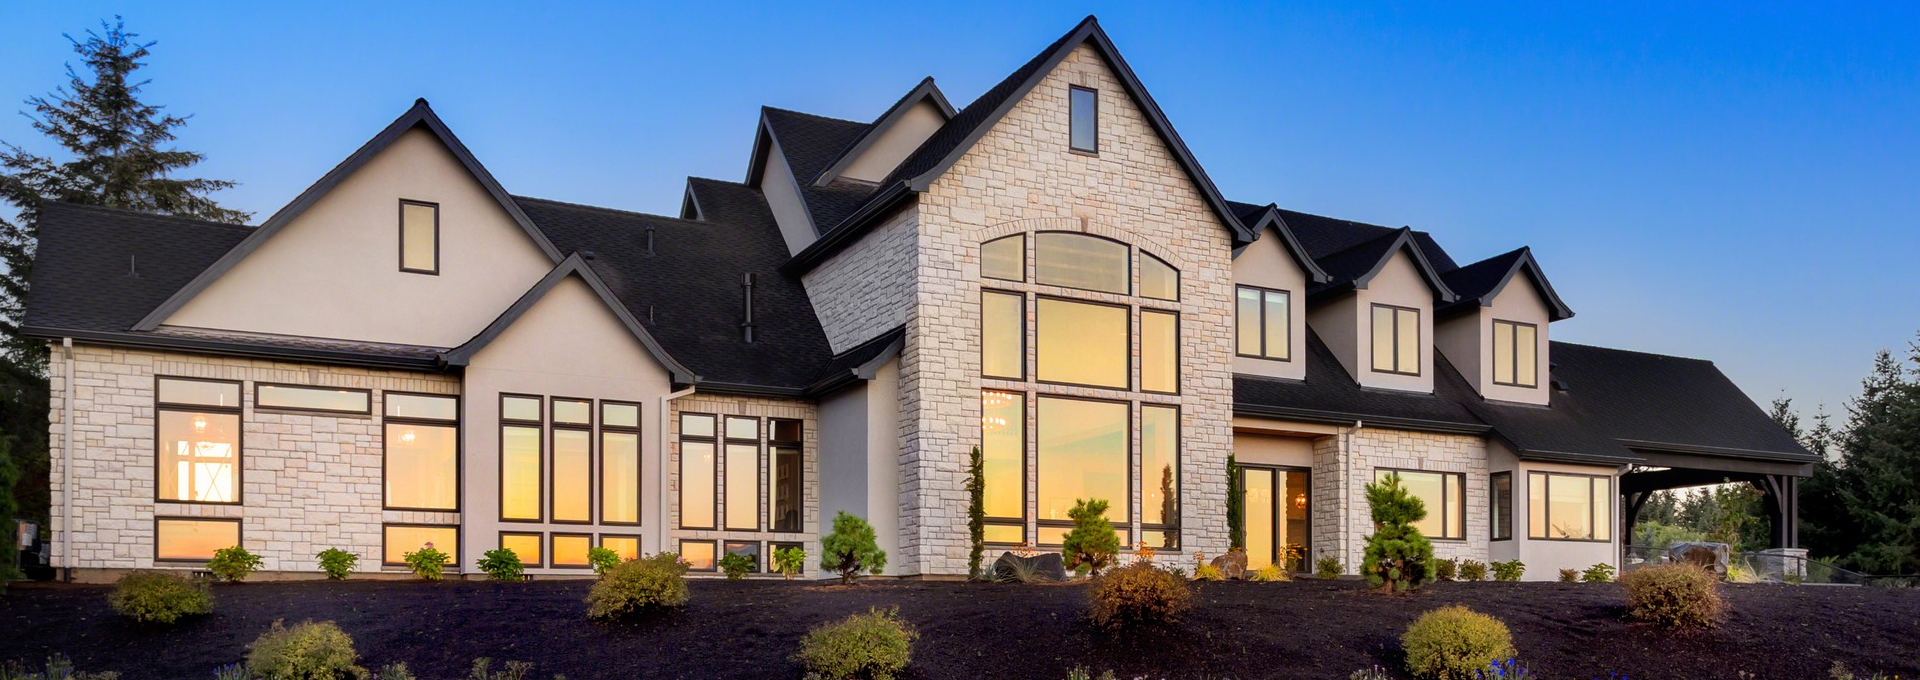 home appraisal website design banner